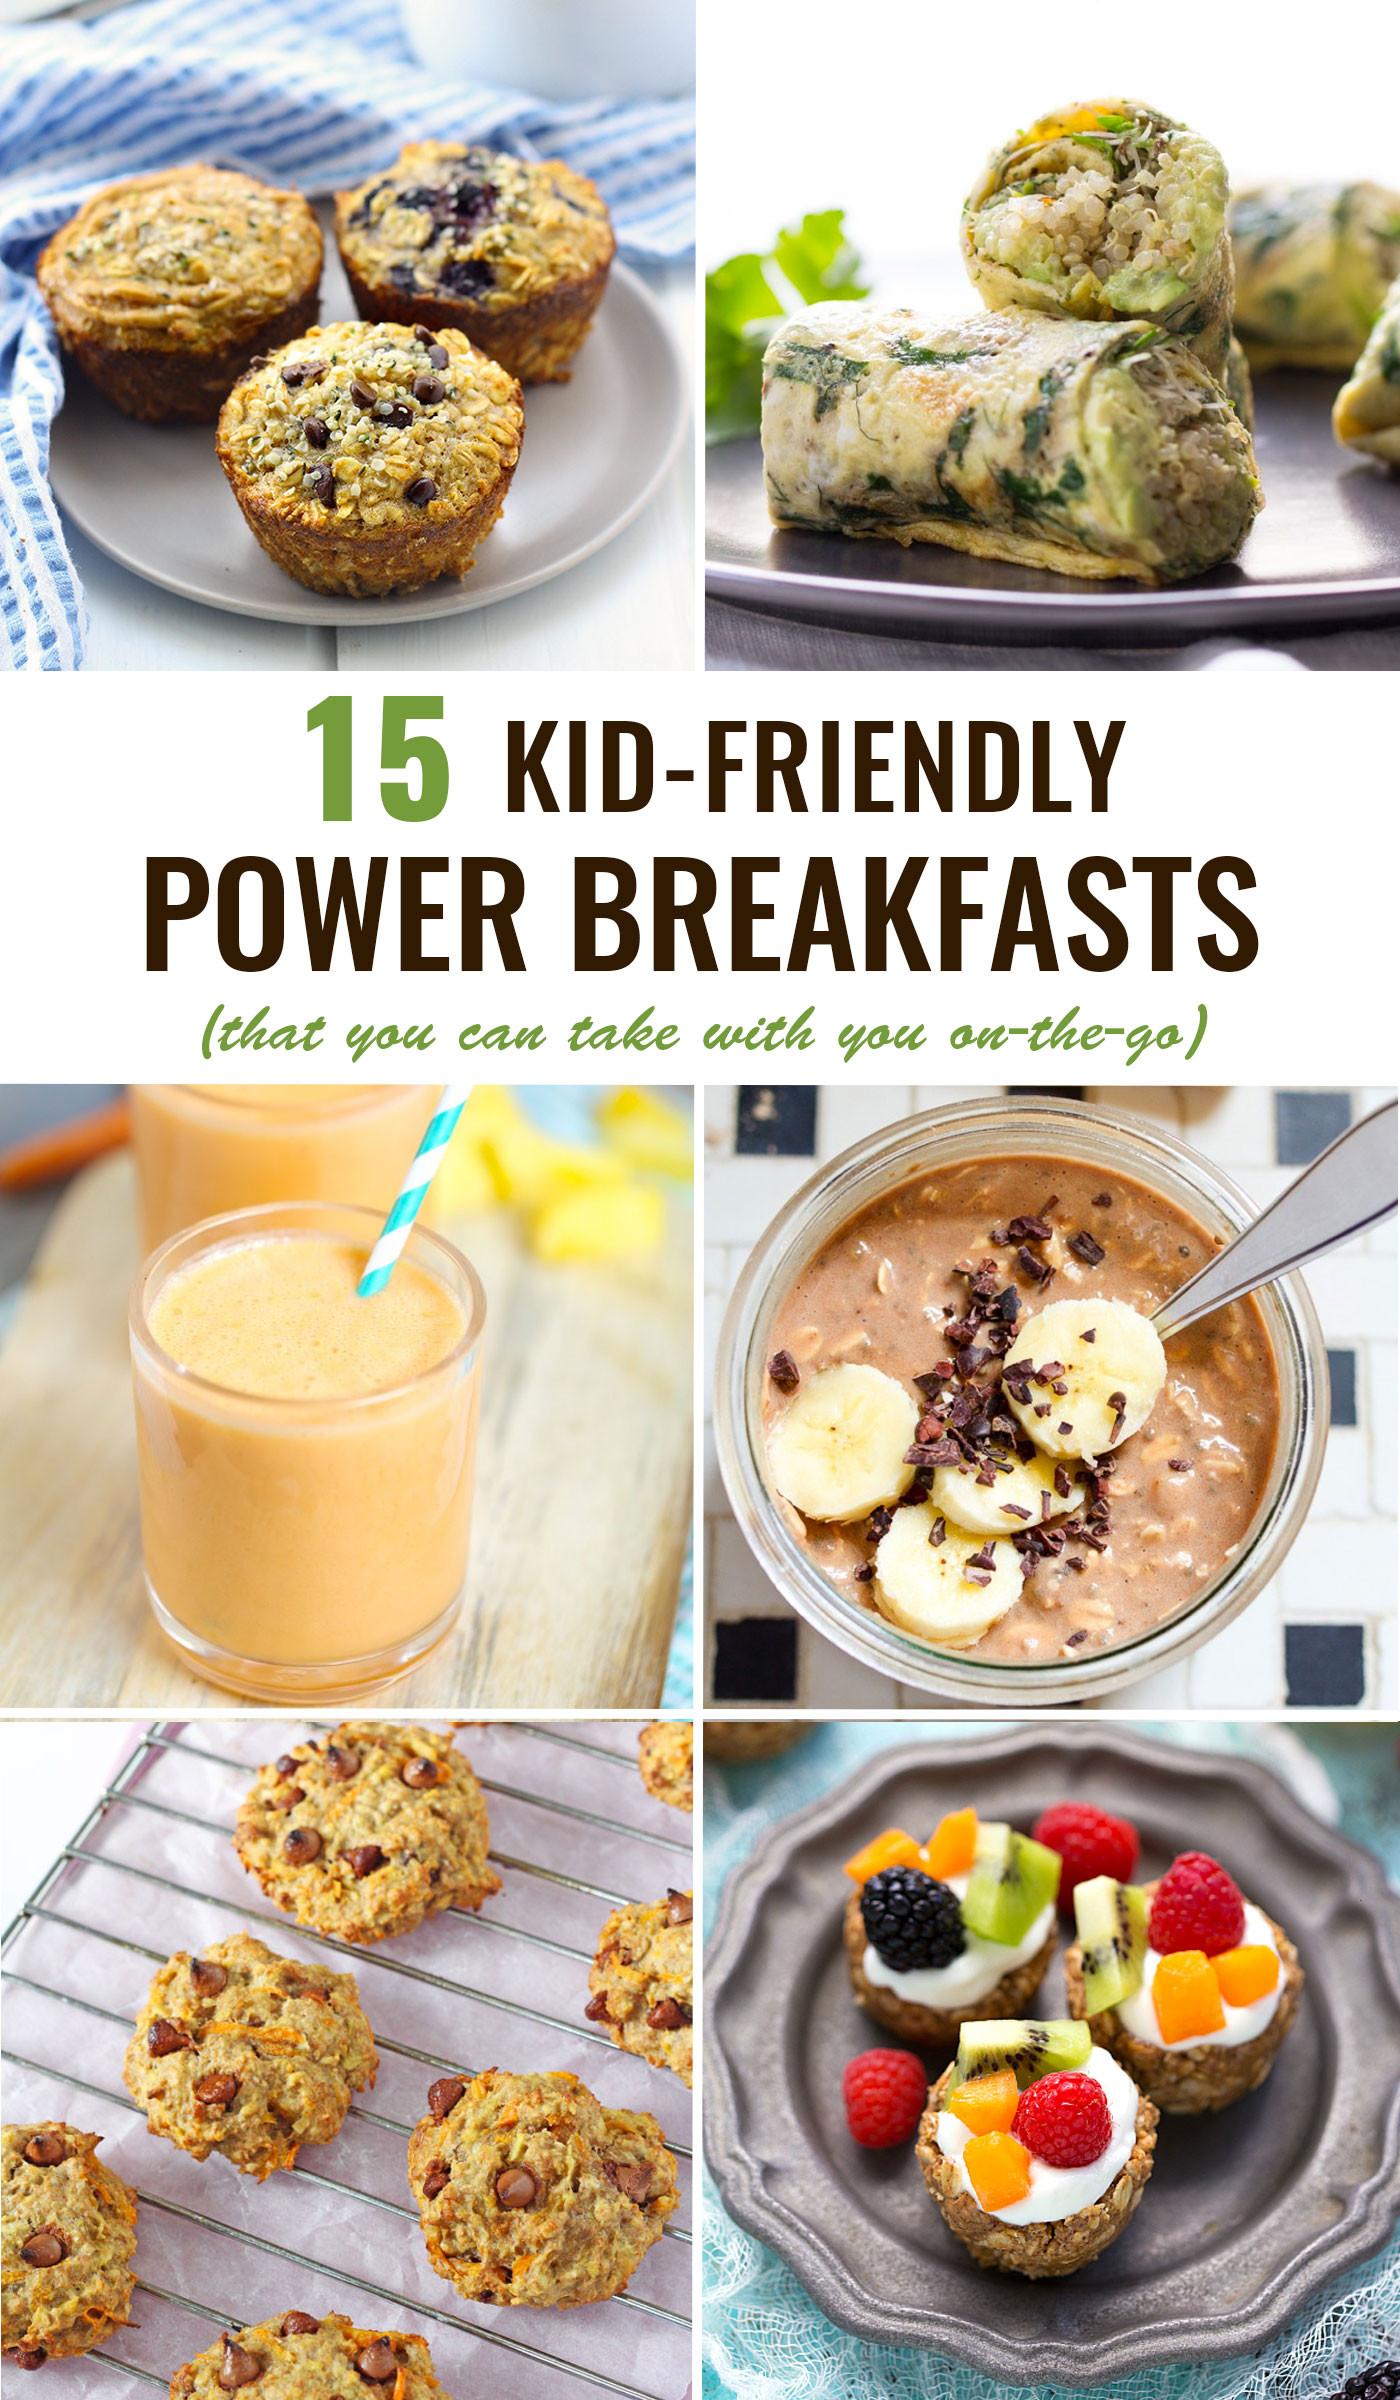 Healthy Breakfast To Go  Kid Friendly Power Breakfasts To Go